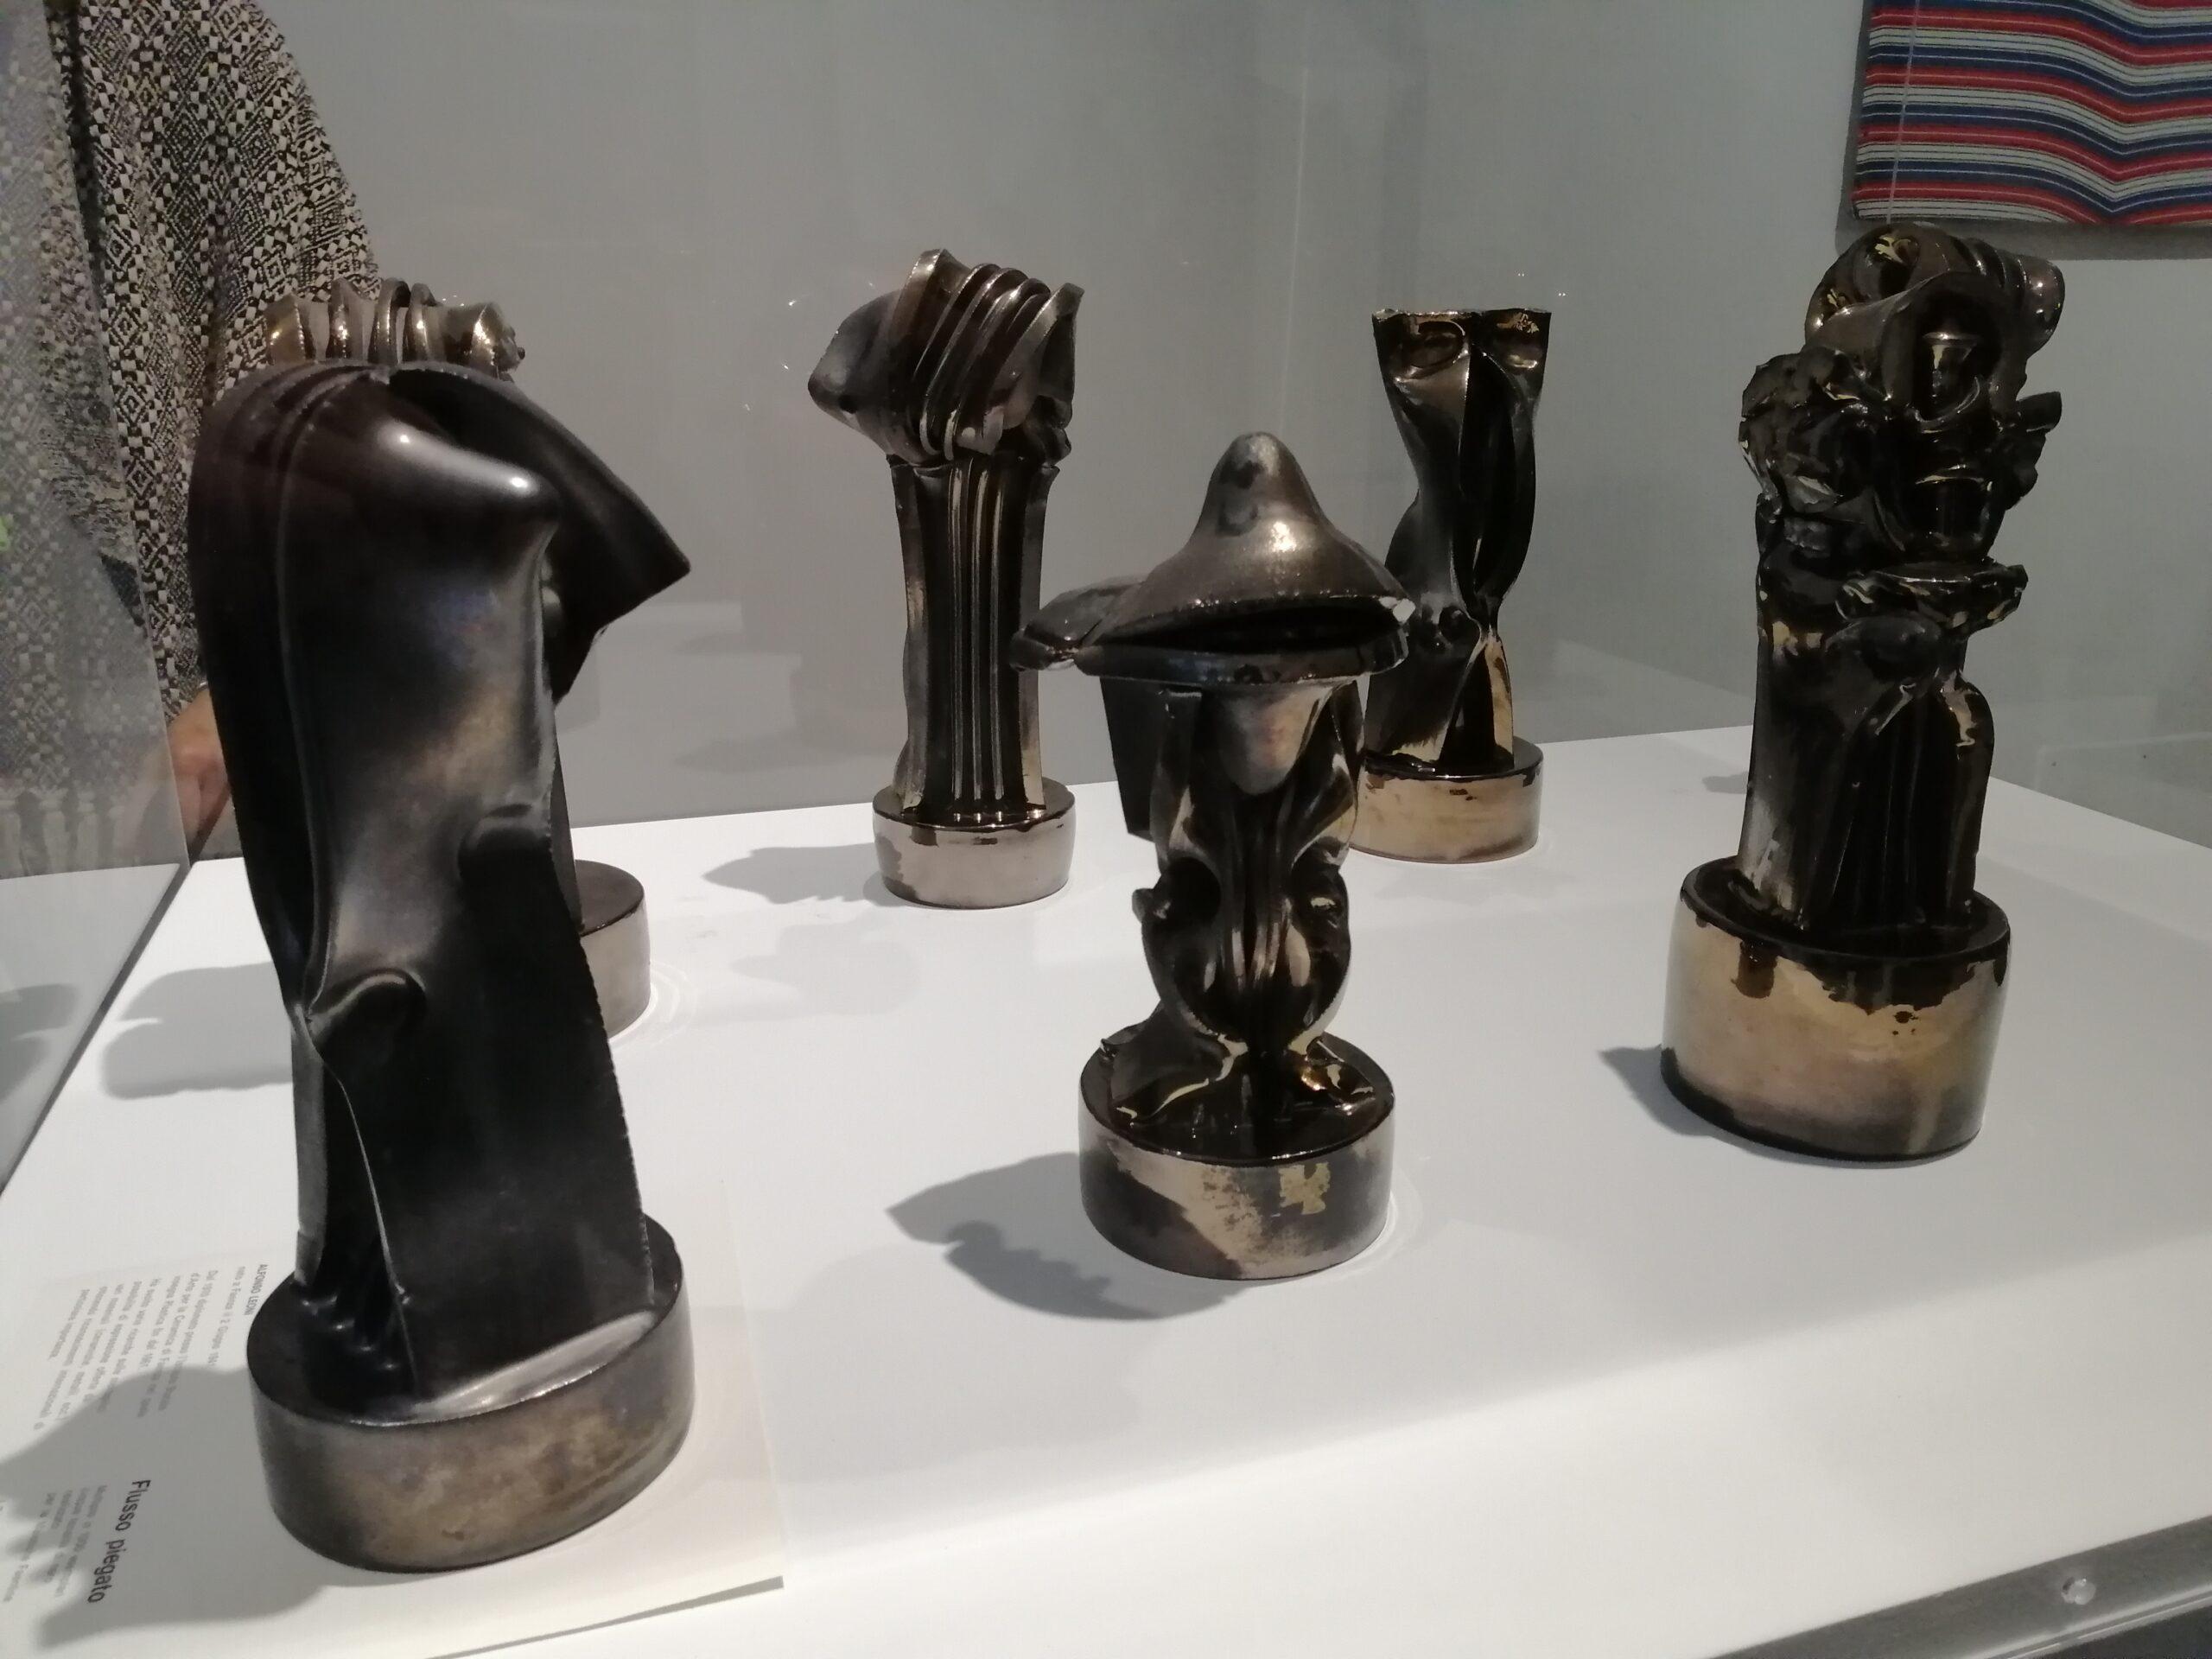 Alfonso Leoni: vent'anni di pura sperimentazione artistica in mostra al MIC di Faenza